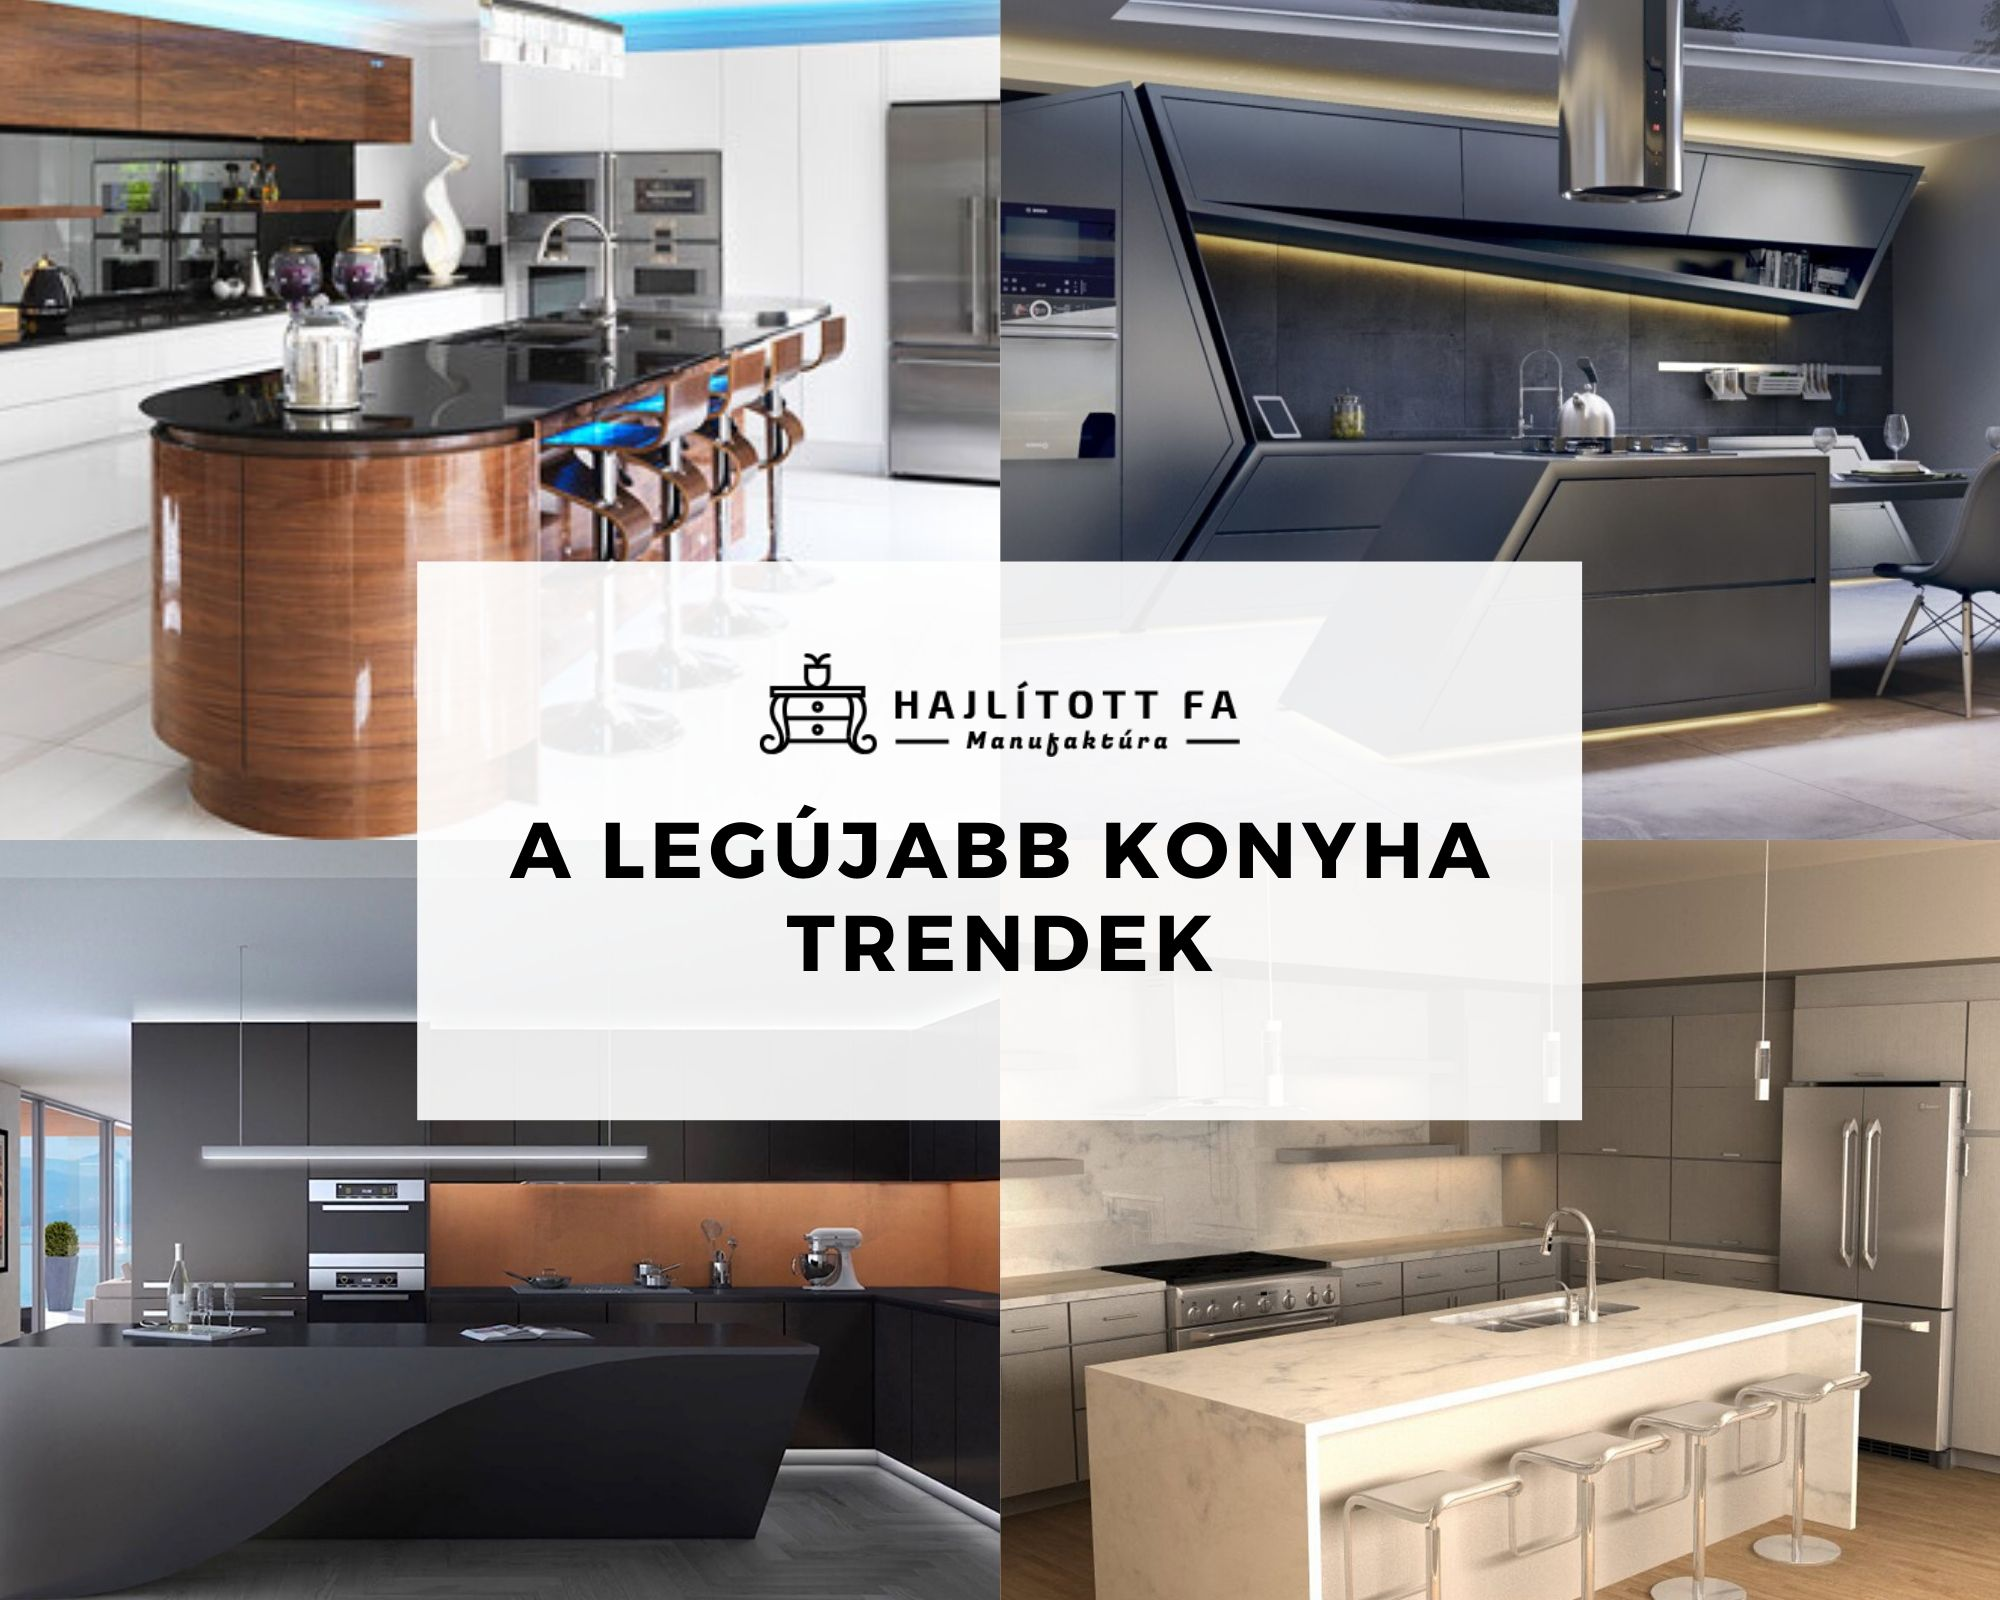 Szép-modern-konyha-design-trend-képek-2020-2021